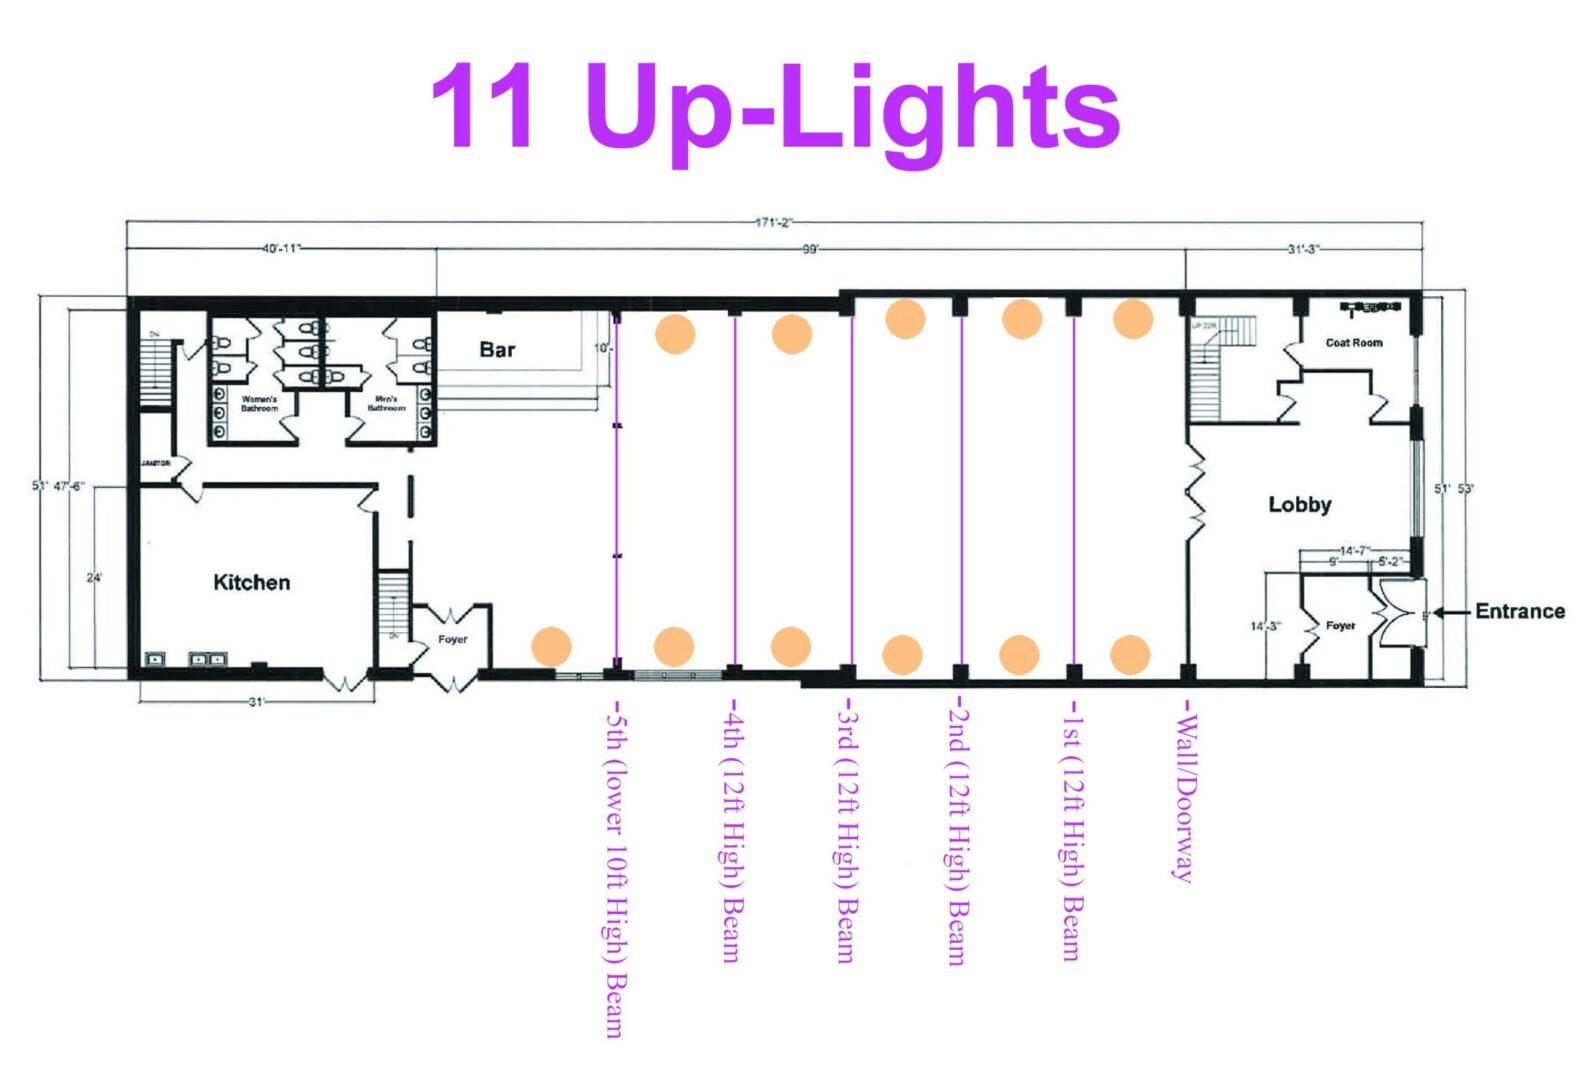 26 Bridge (11 Up-Lights)